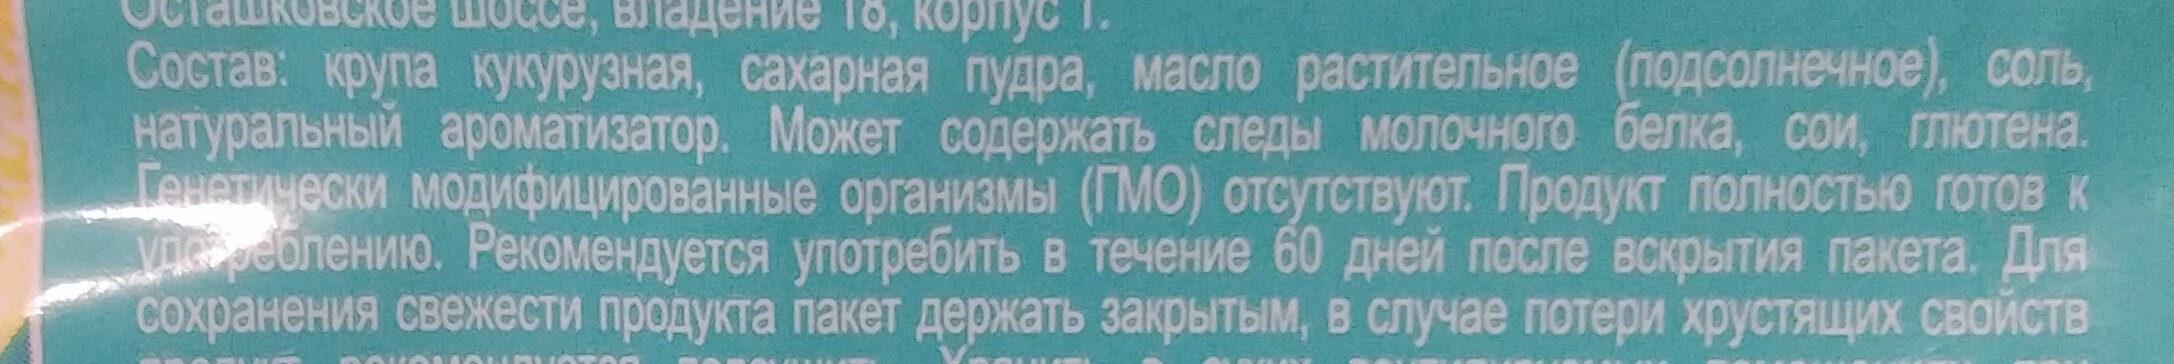 Кукурузные палочки с сахарной пудрой - Ingredients - ru